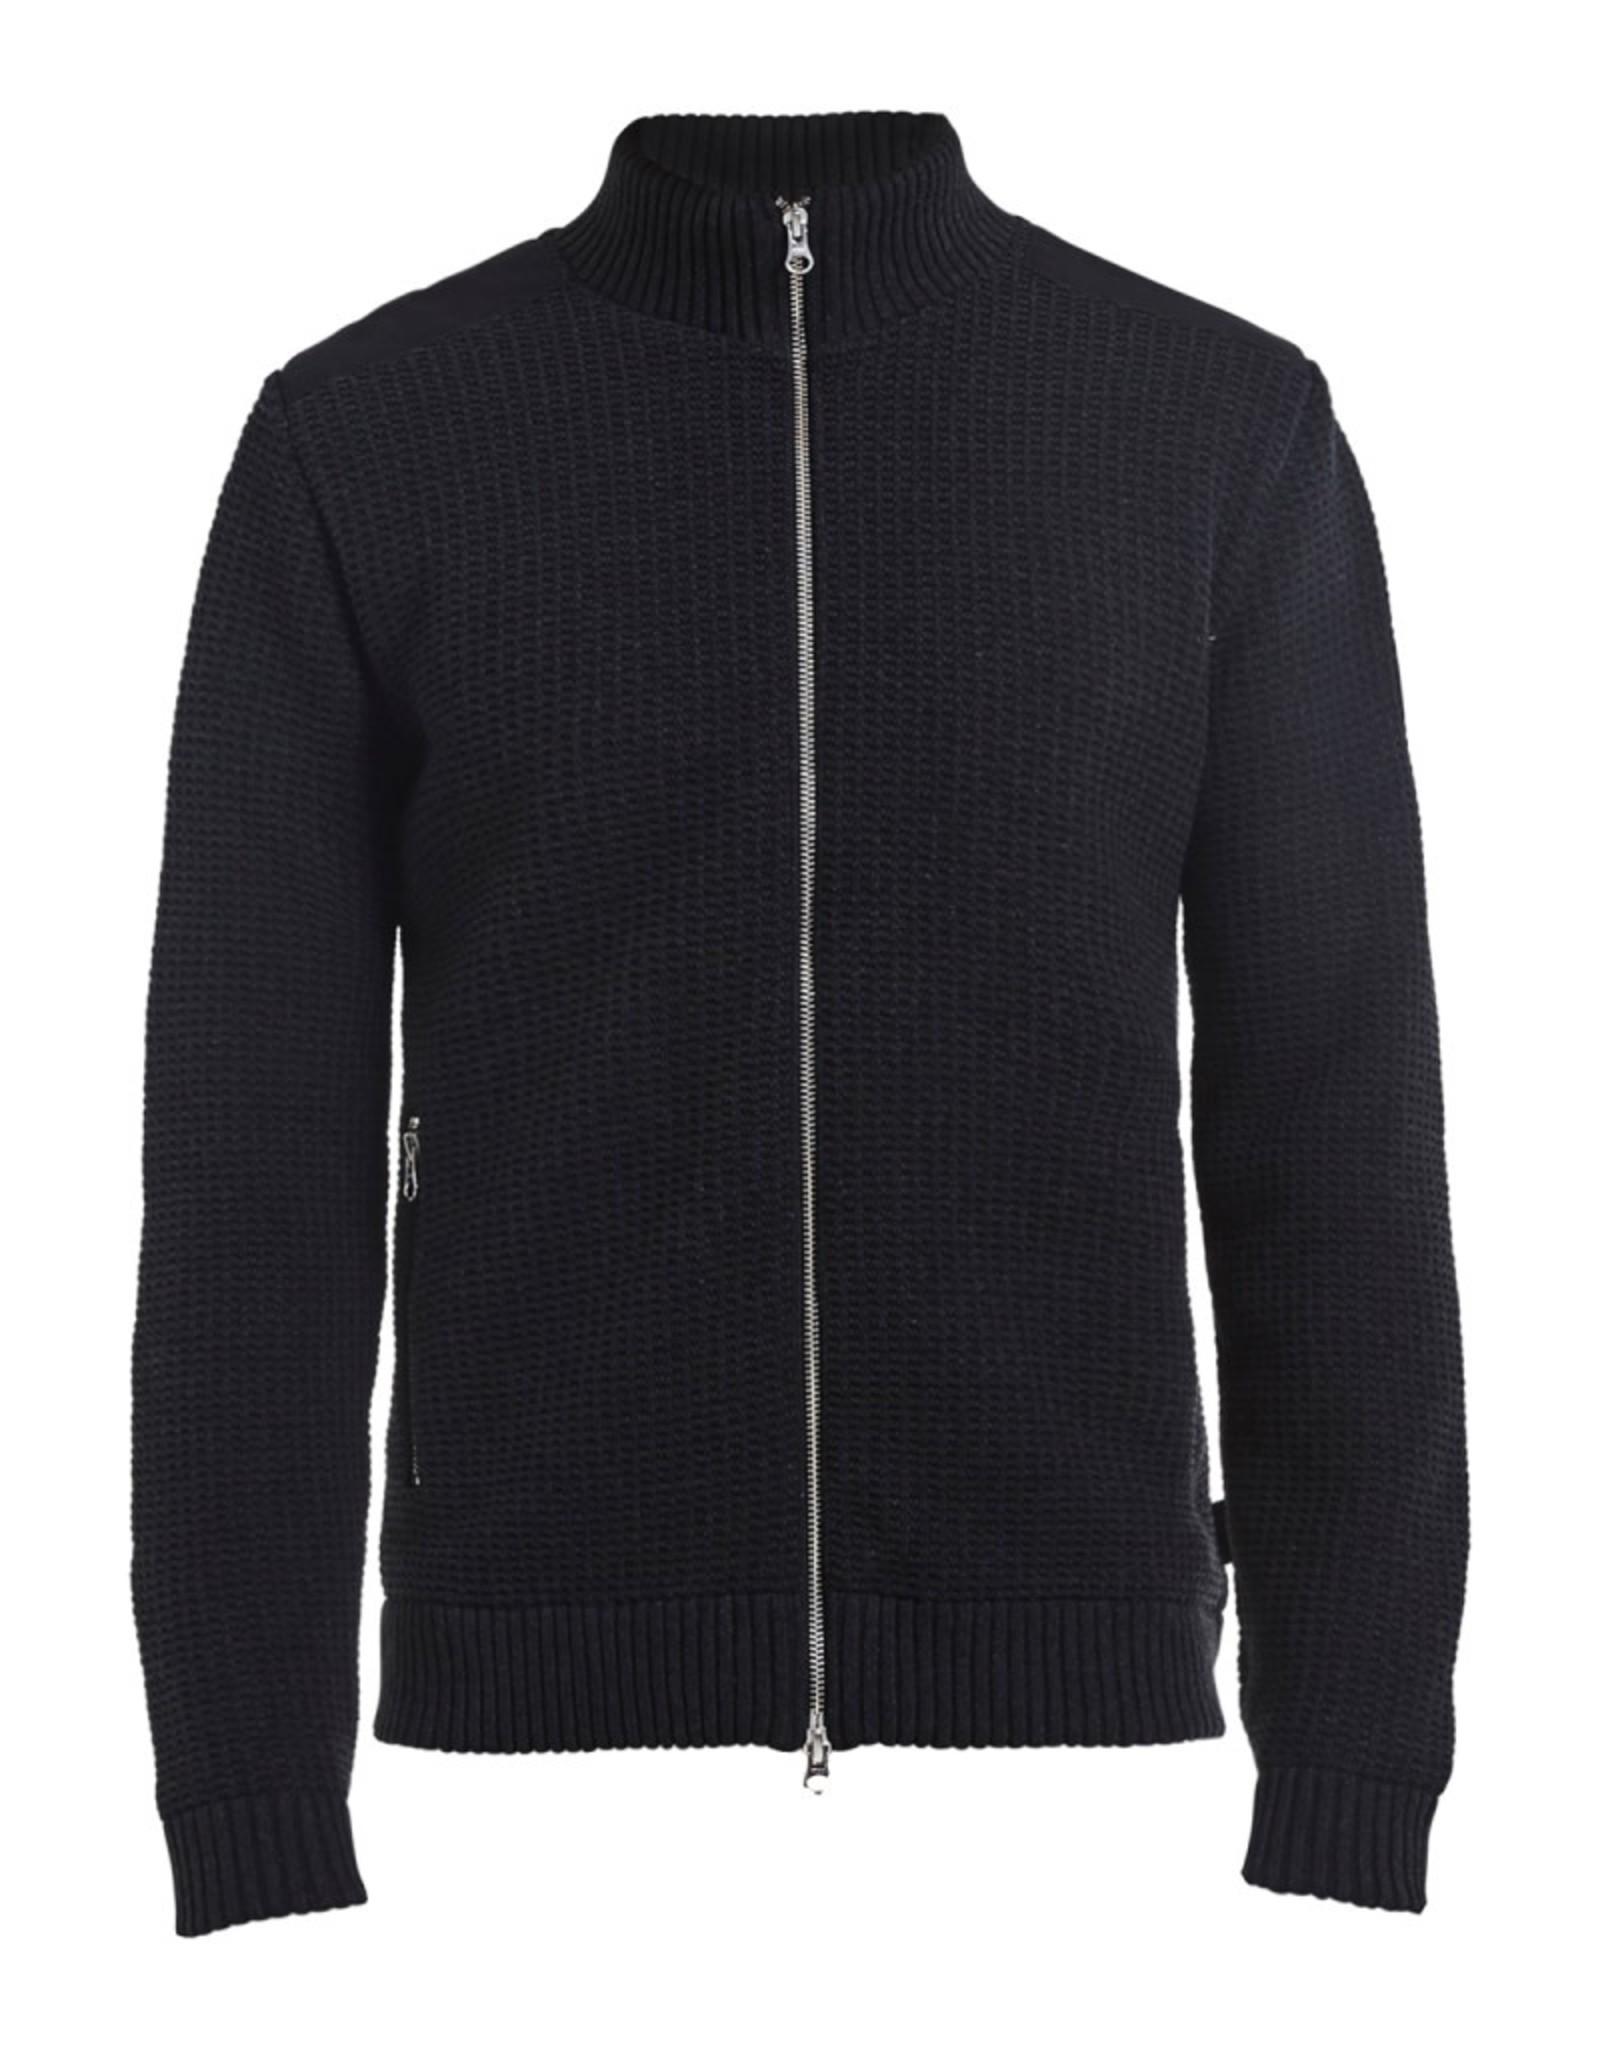 Holebrook Tommy Windproof Jacket